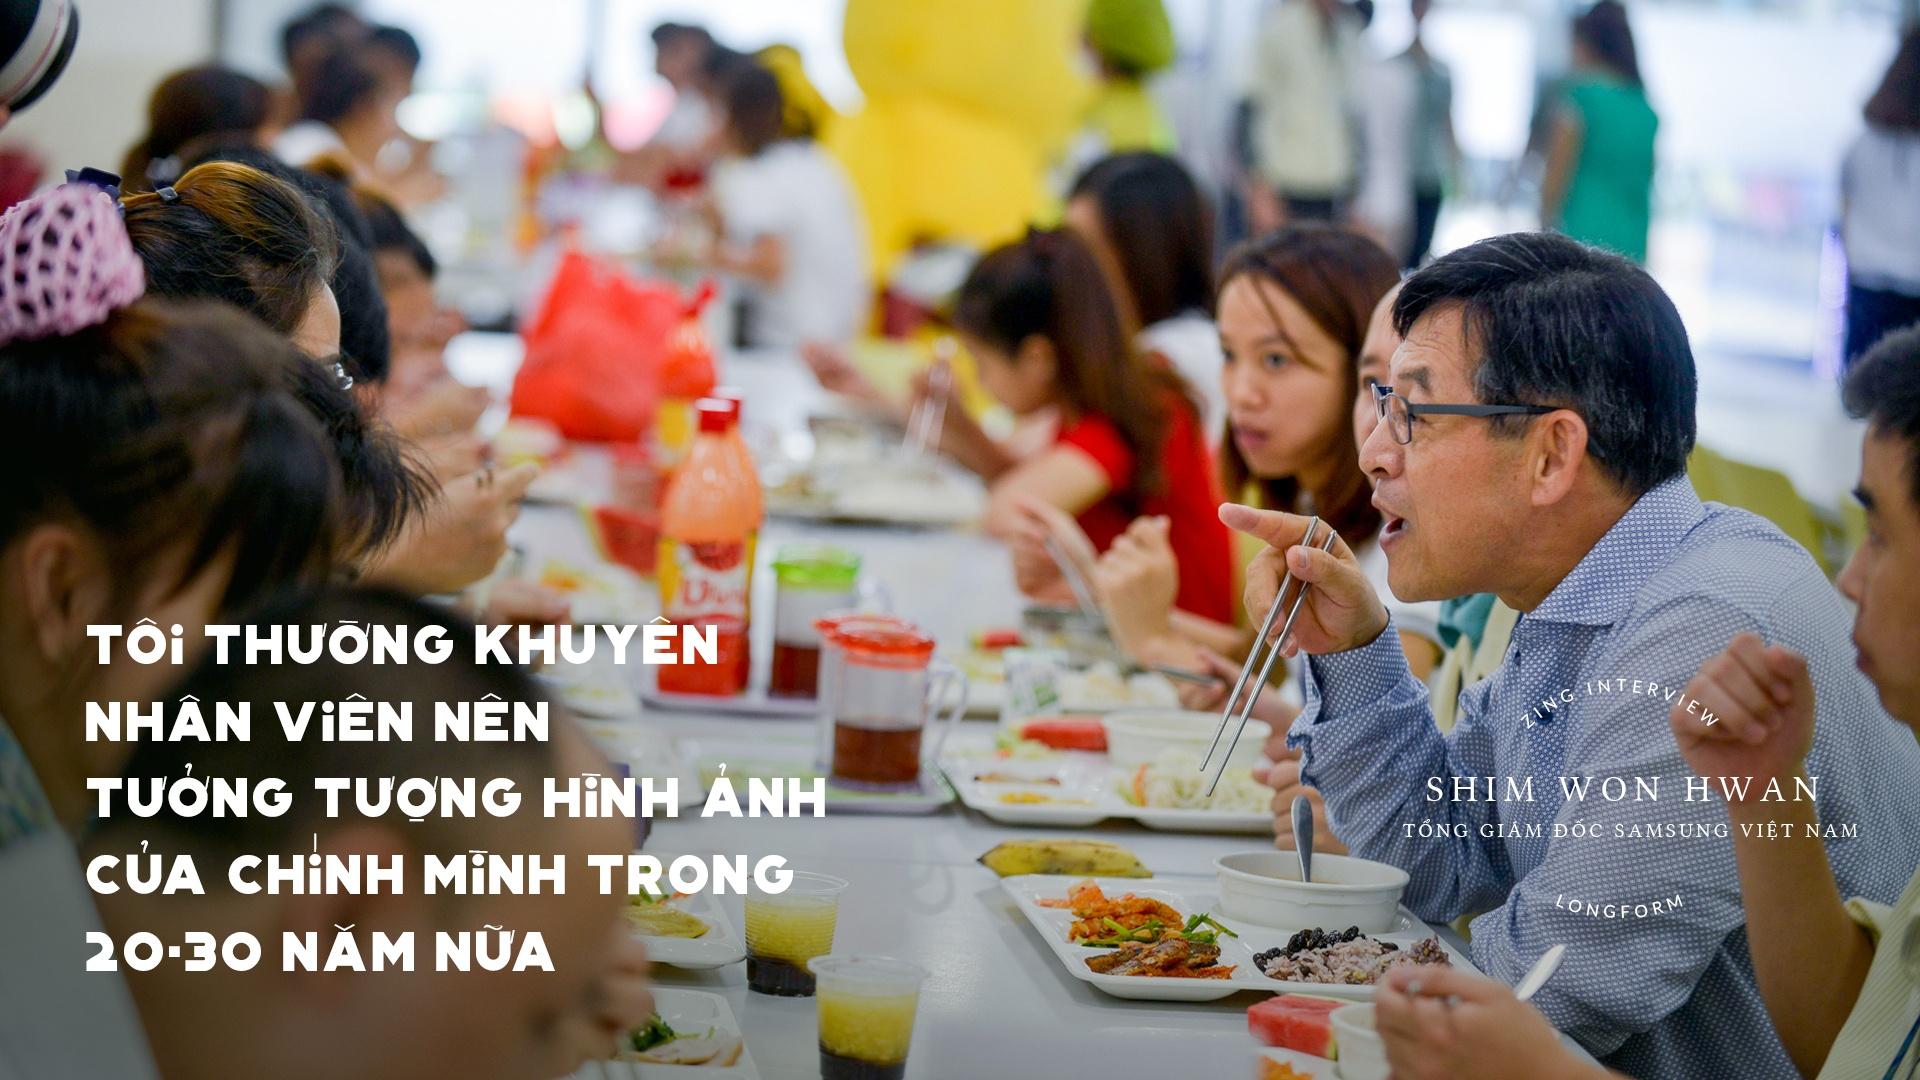 'Nhan vien nguoi Viet lam nen thanh cong cua Samsung Viet Nam' hinh anh 9